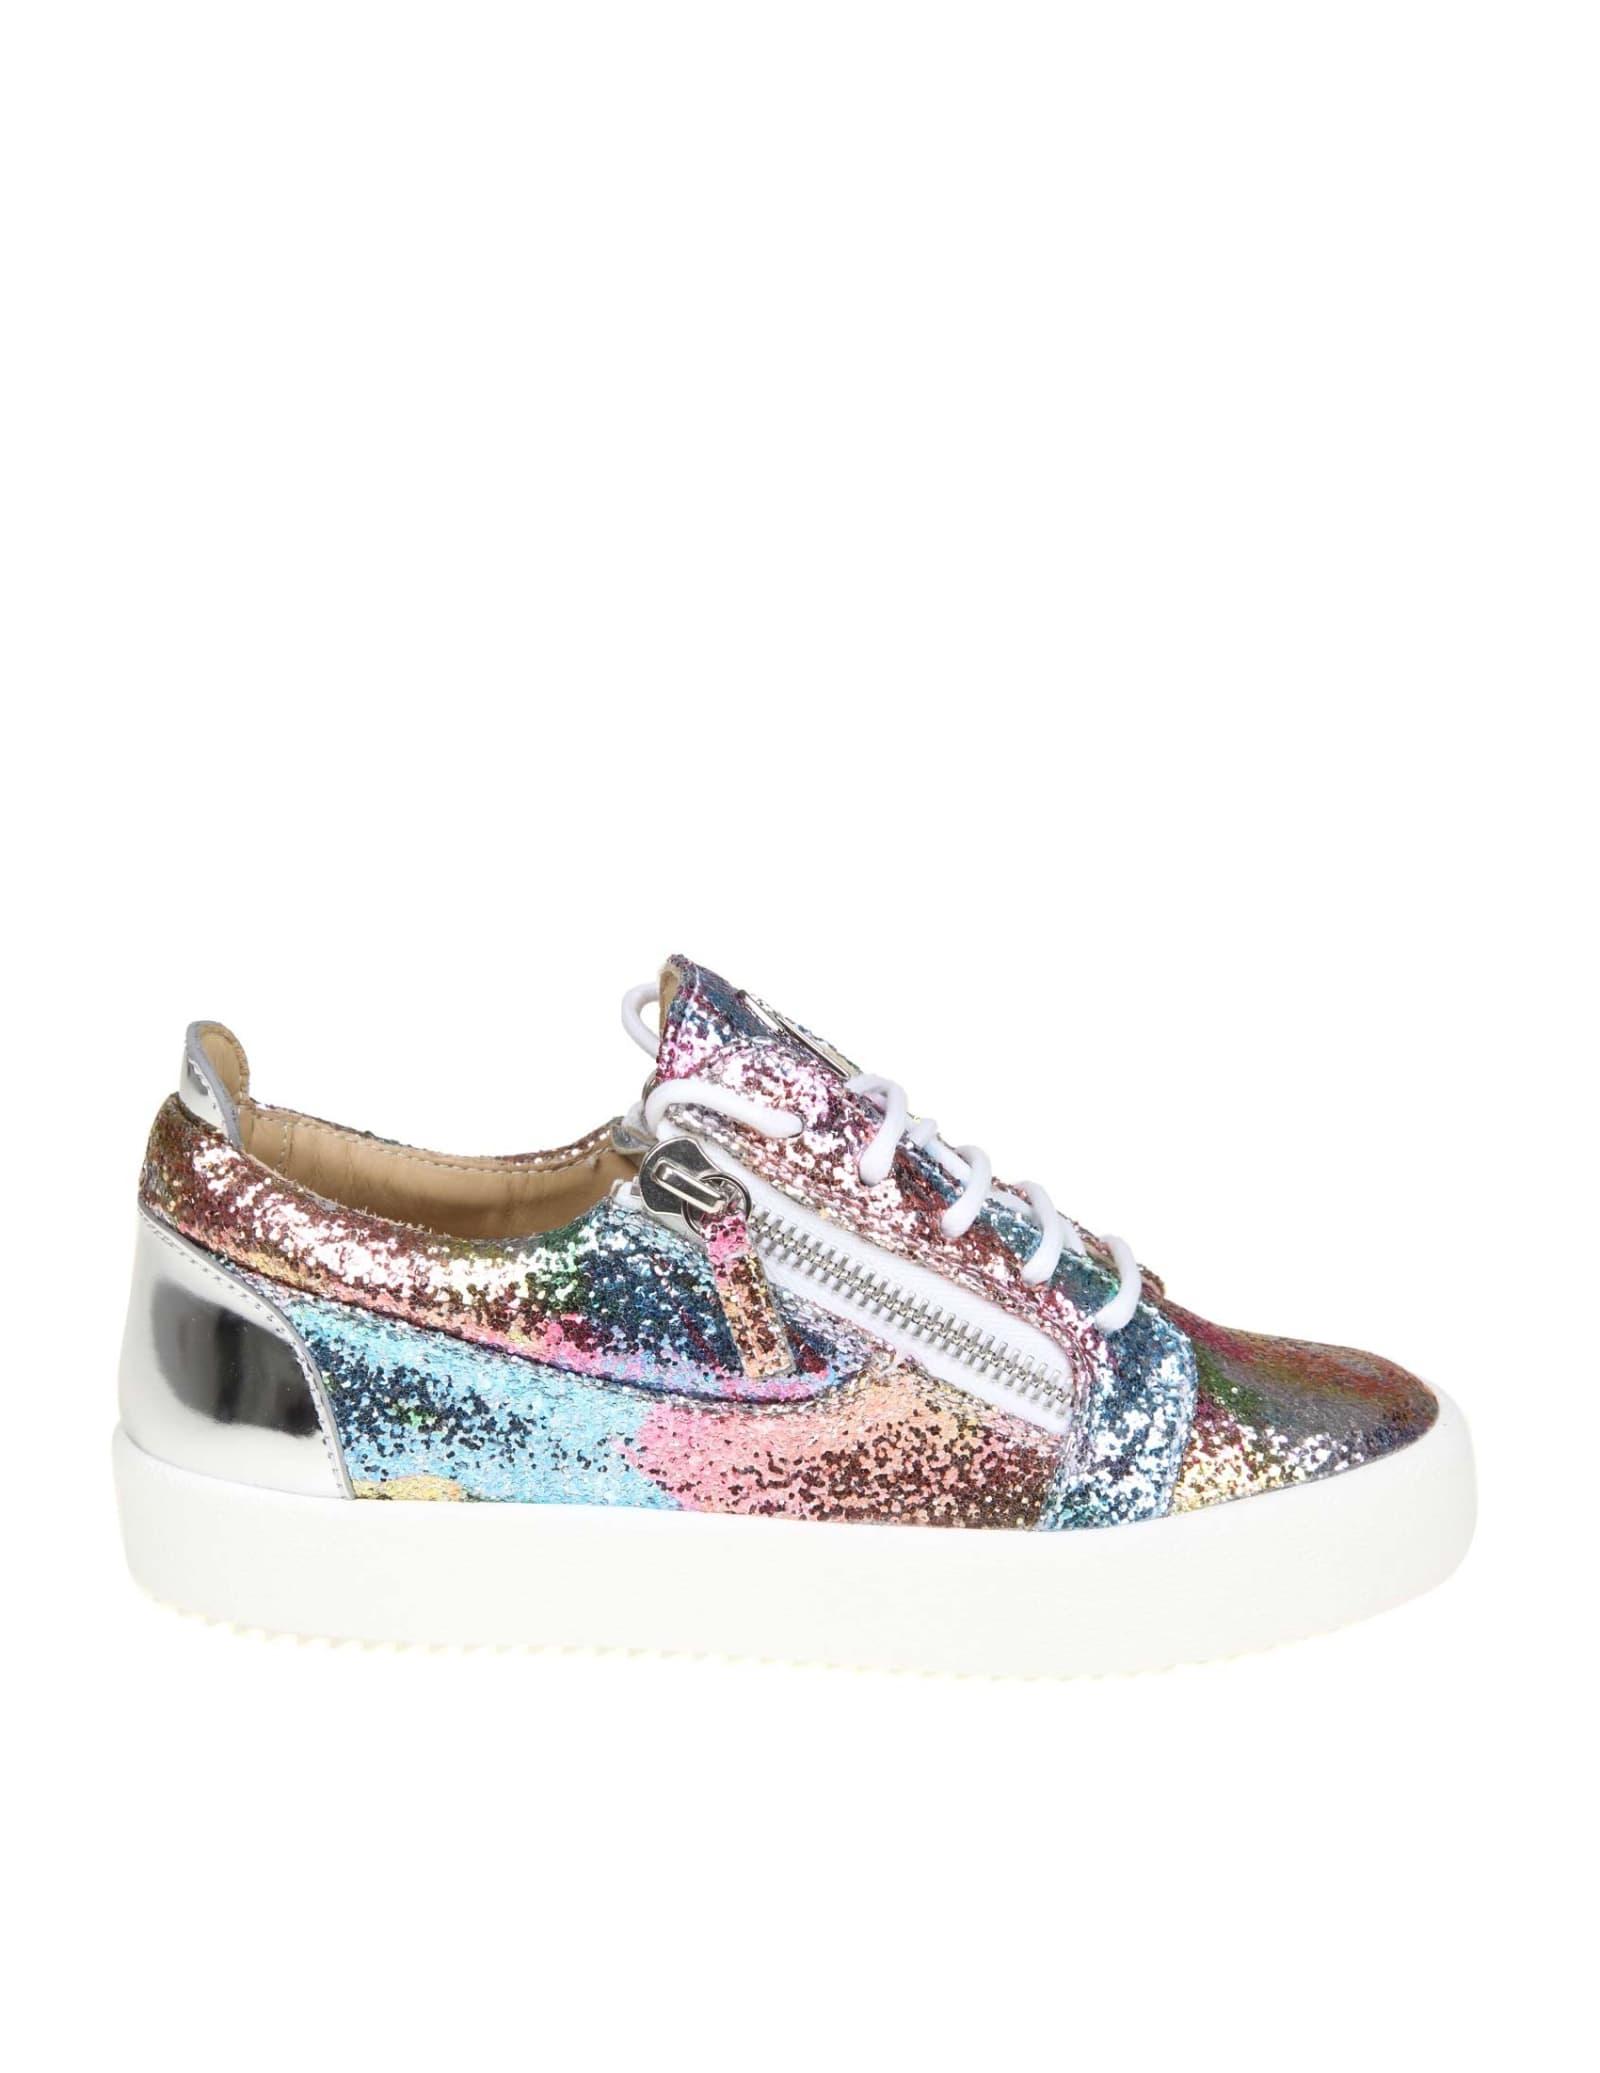 88b92b9286d05 Giuseppe Zanotti Sneakers Giuseppe Zanotti Fabric Glittery Multicolor -  Multicolor ...